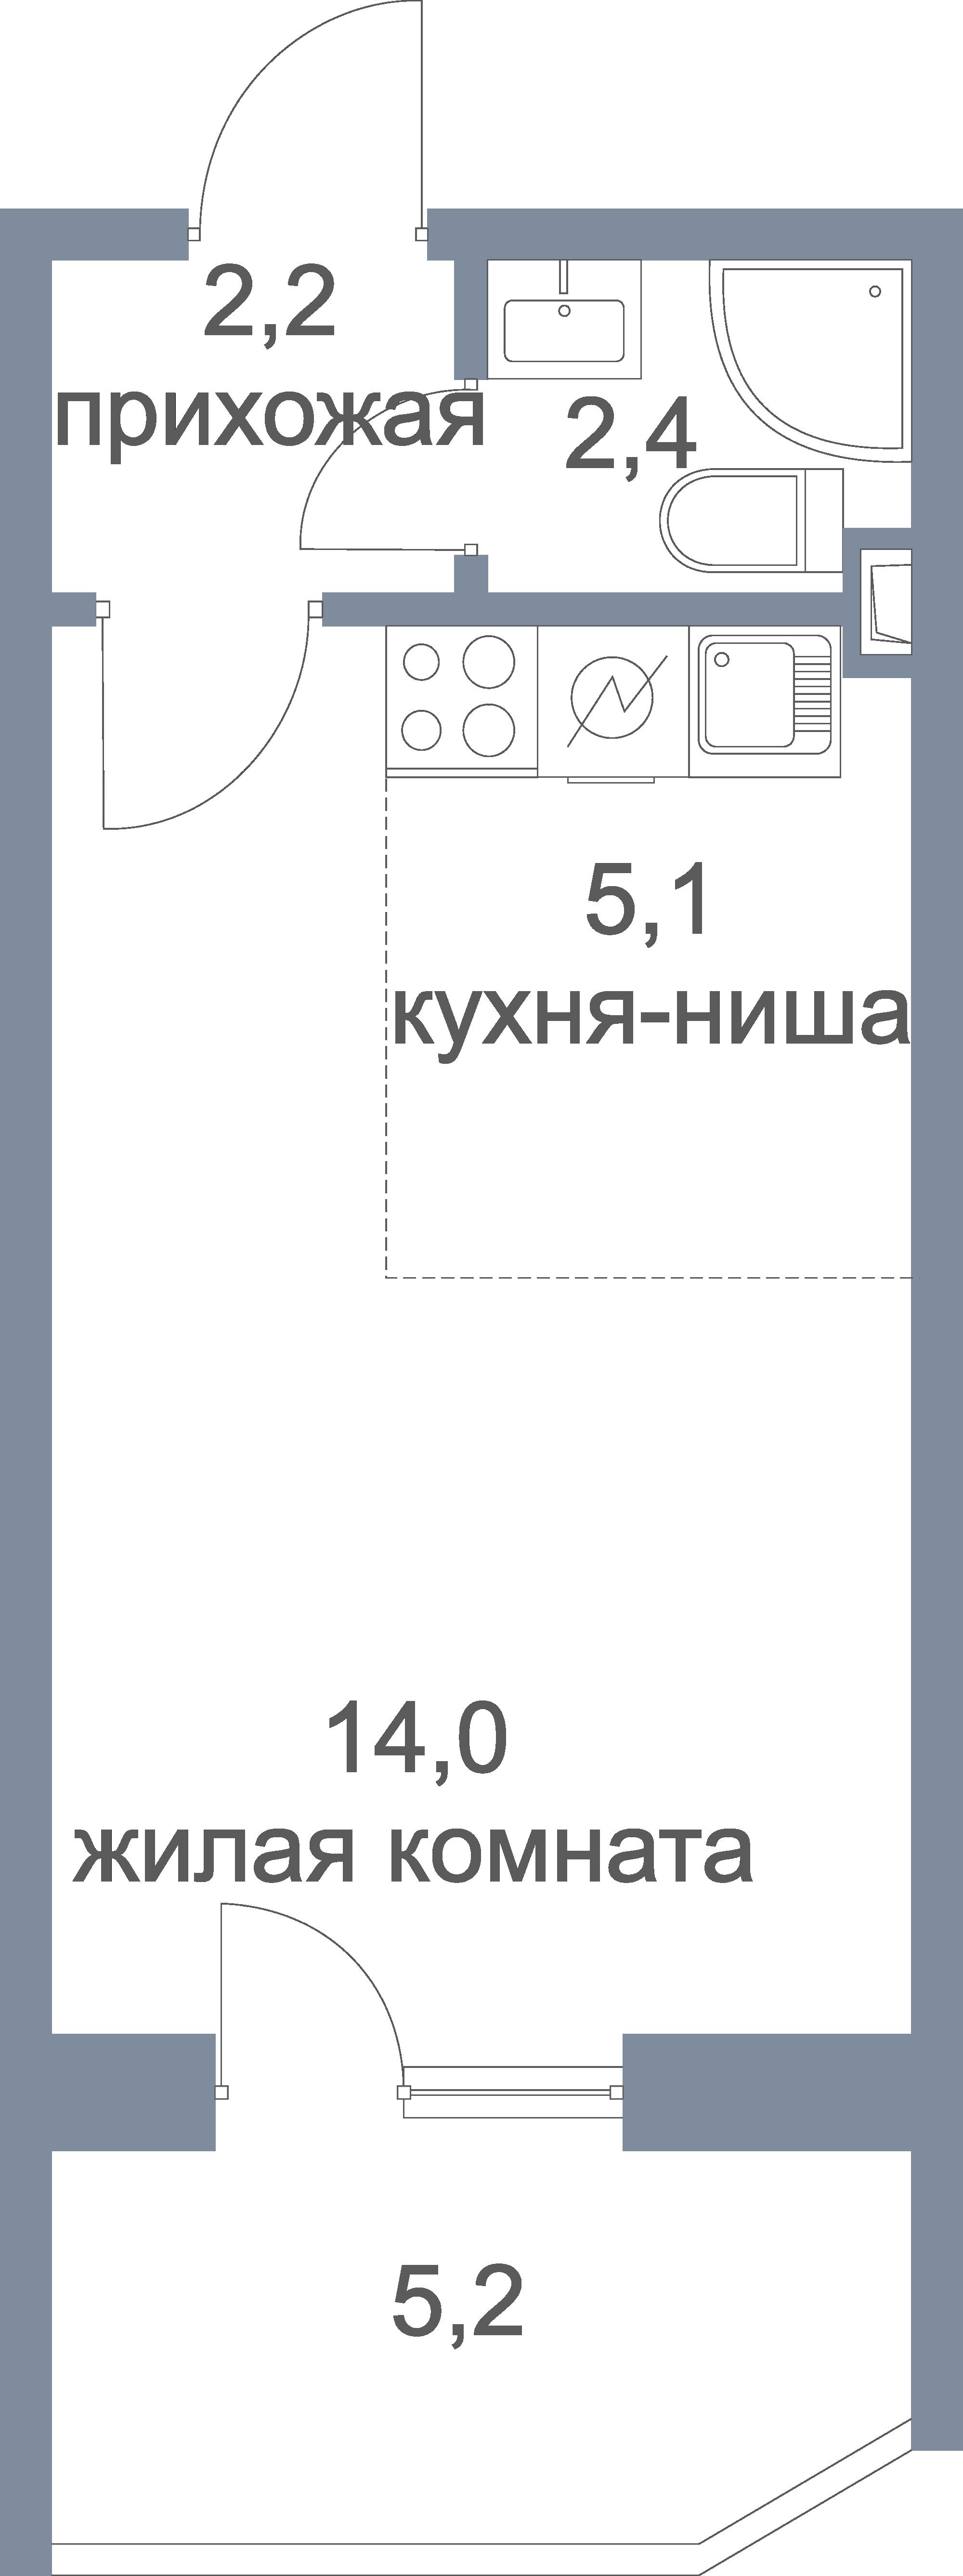 https://pb3241.profitbase.ru/uploads/preset/3241/5d0ca306713fe.png